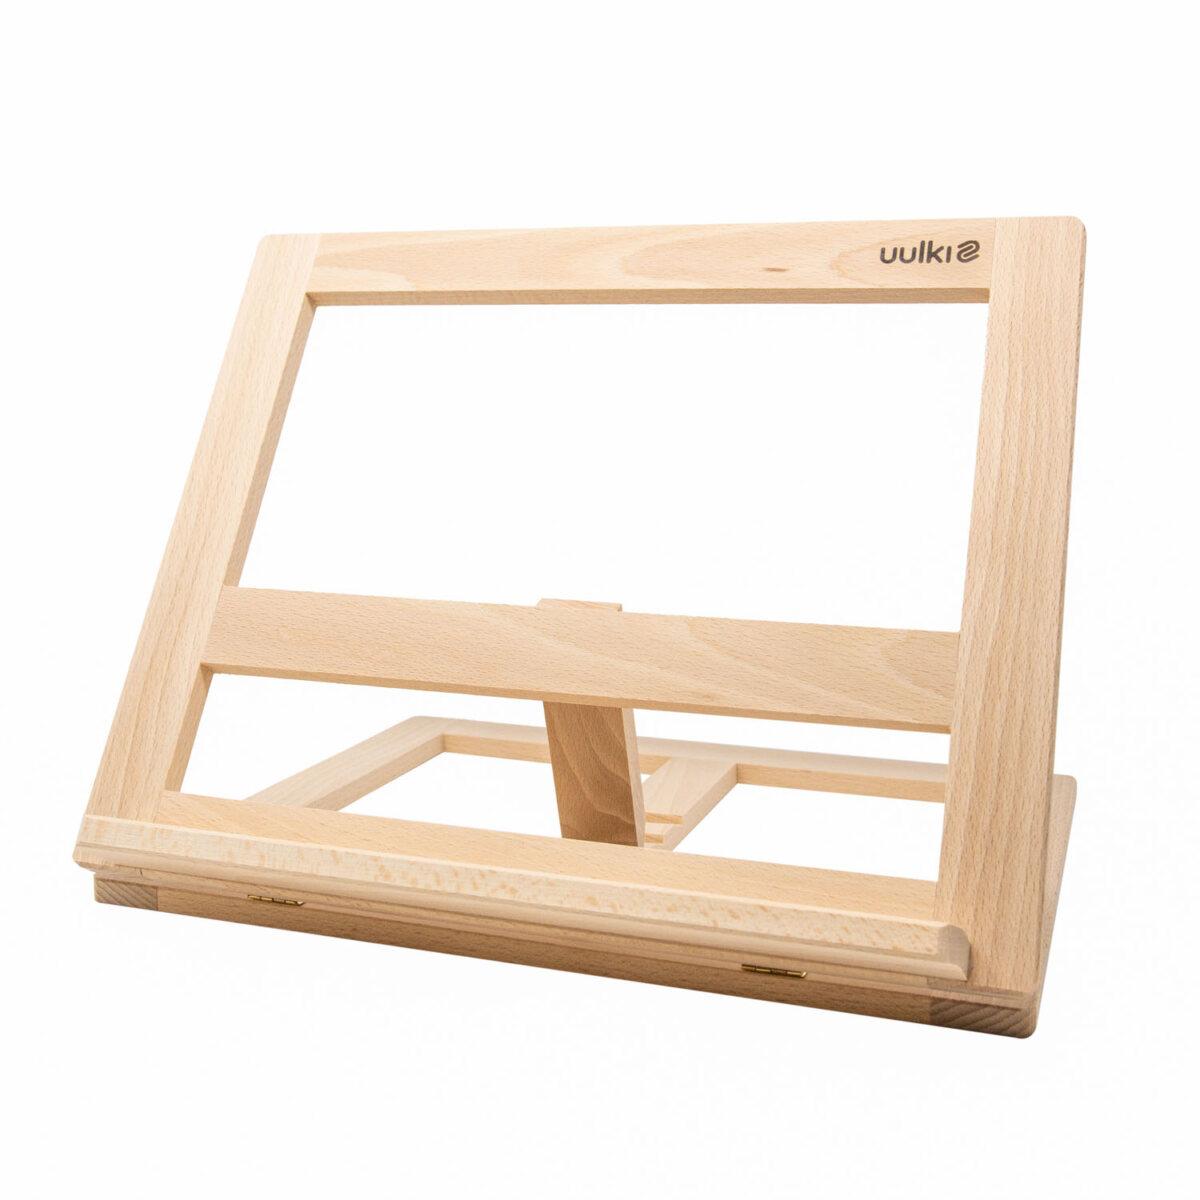 uulki houten kookboekstandaard